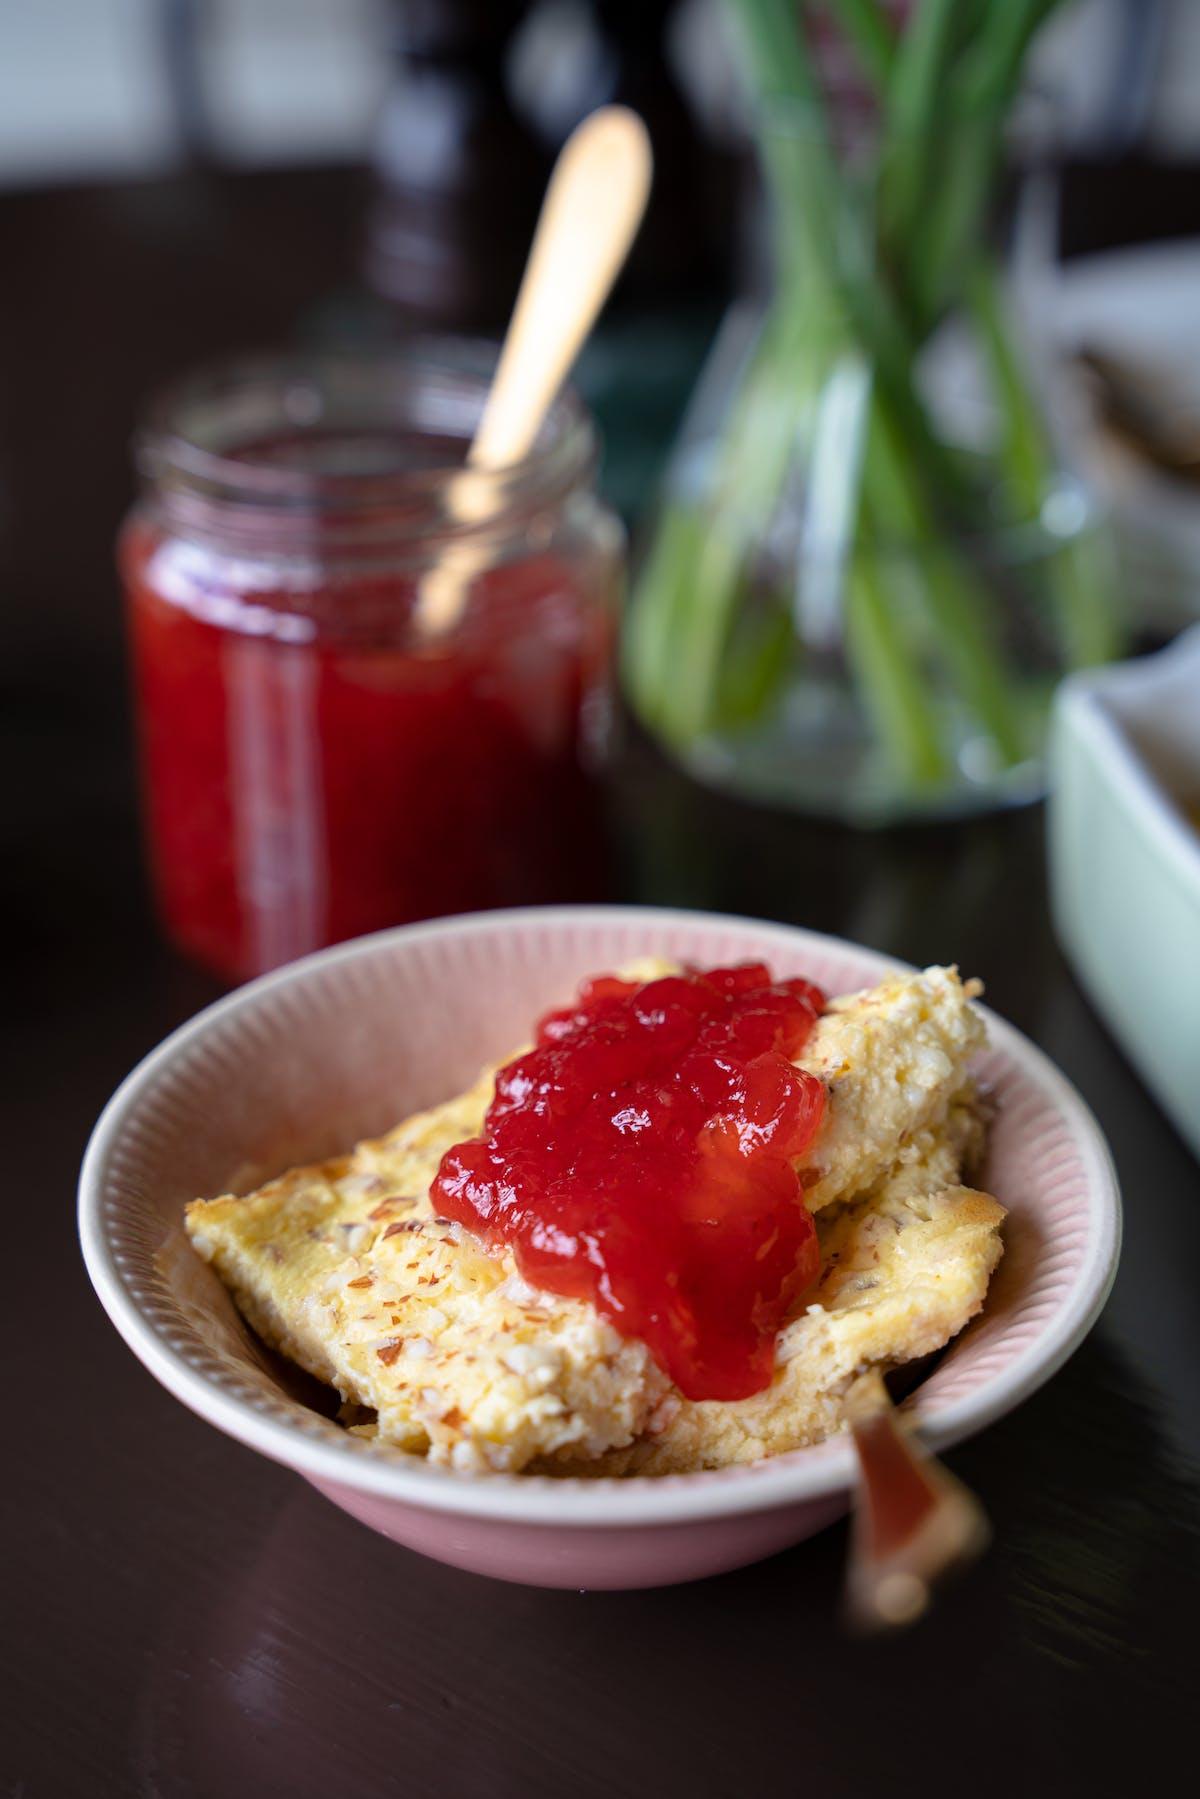 Tarta de queso low-carb sueca con mermelada de fresa